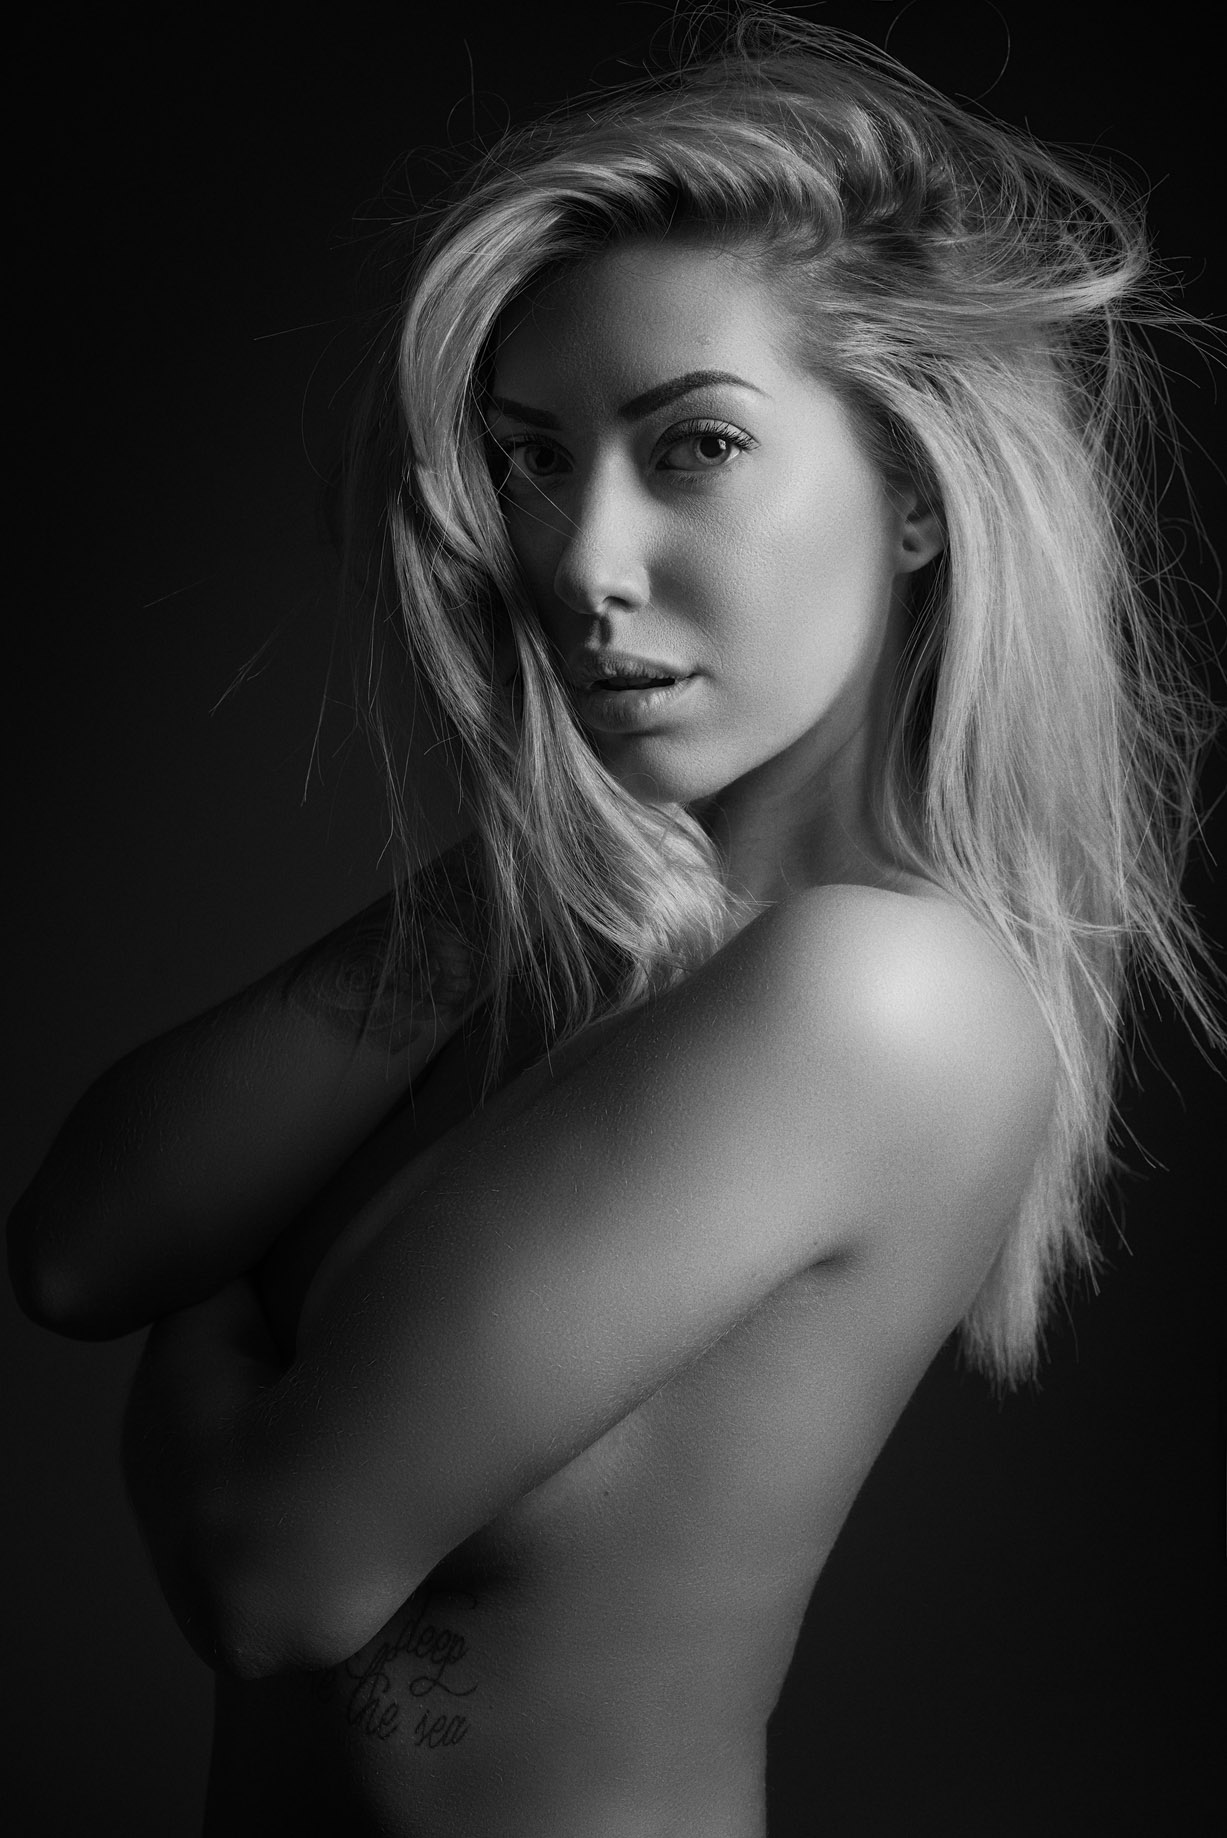 фотограф Joakim Oscarsson